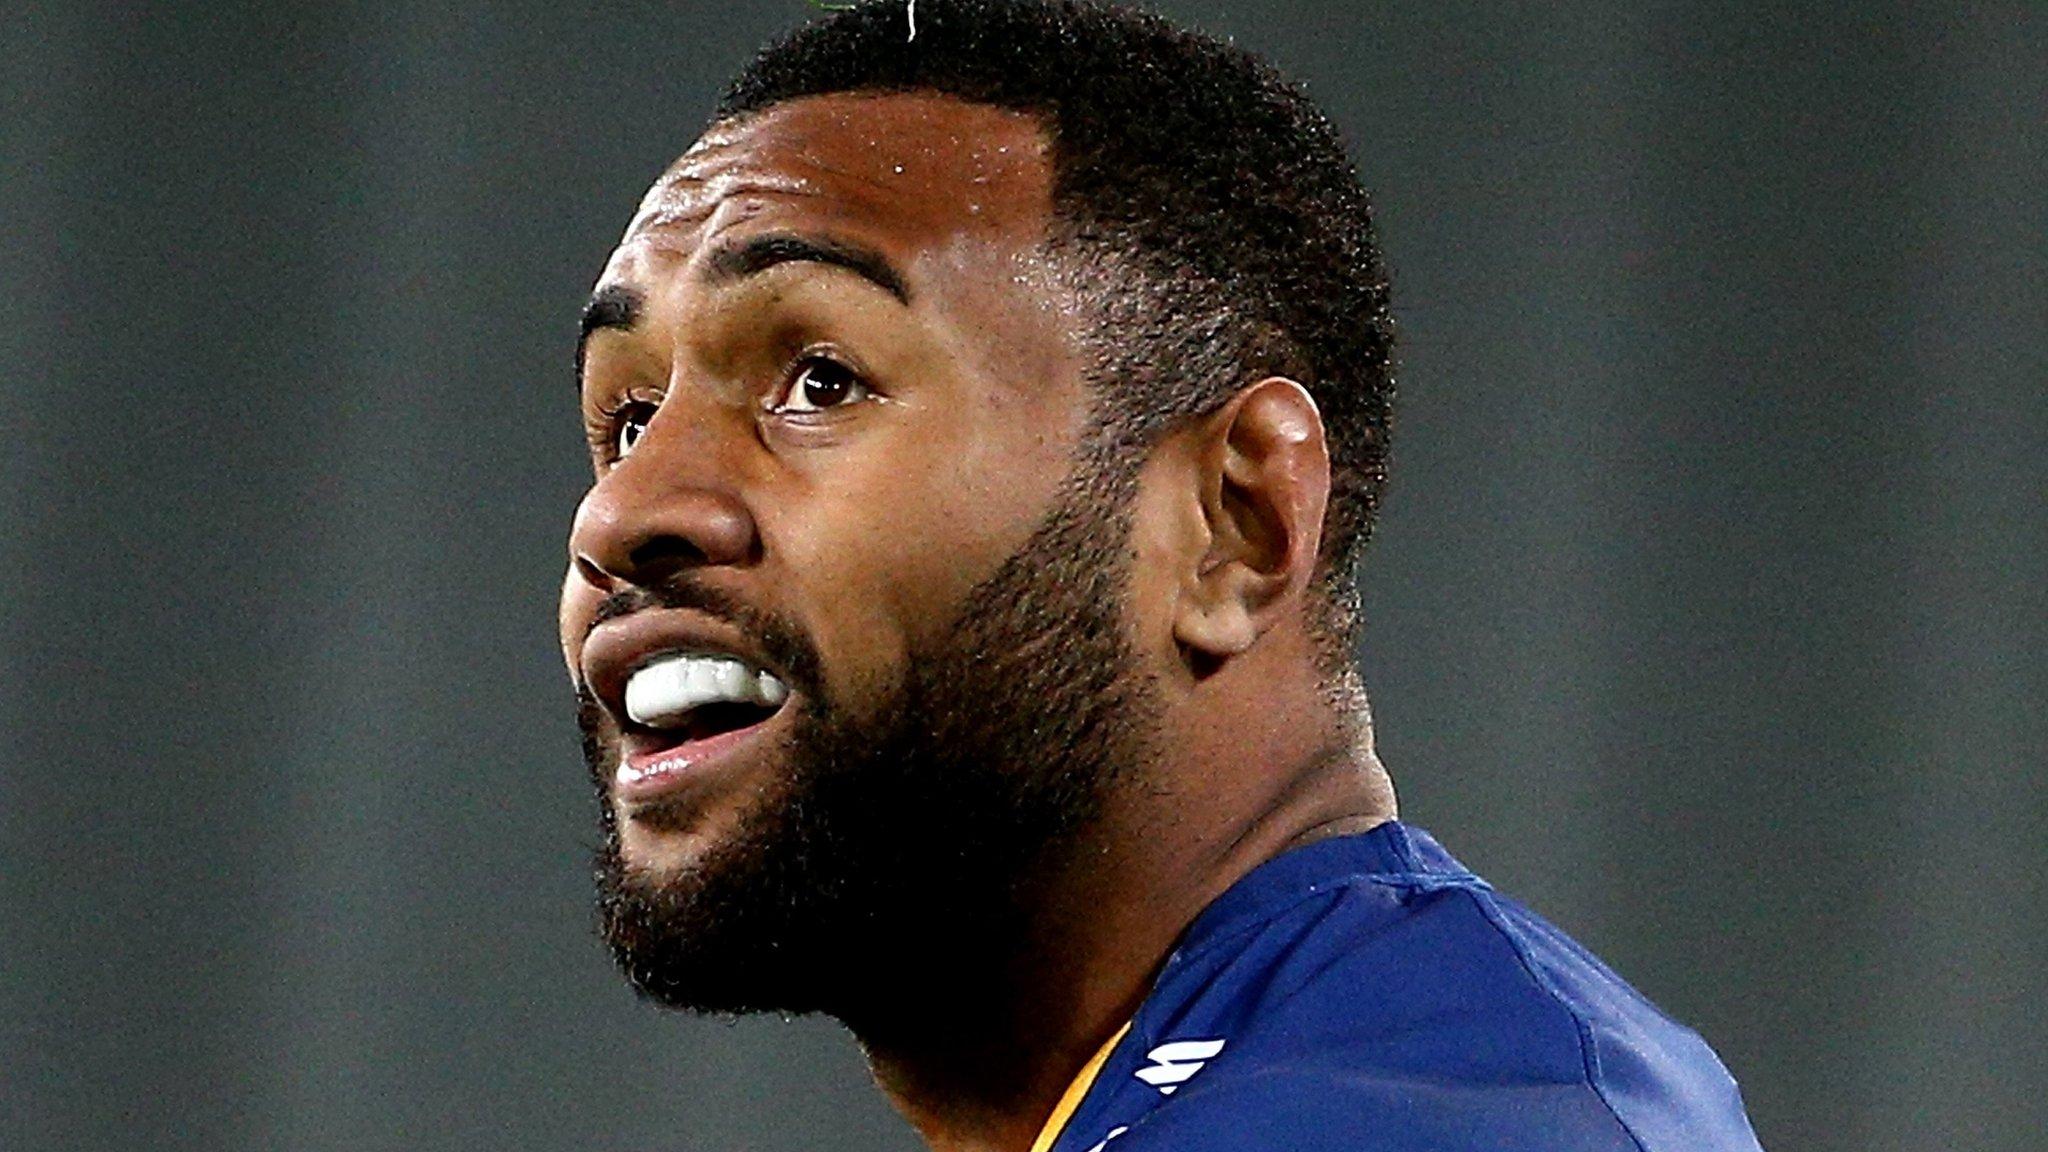 Otago wing Nareki plays with 'smashed testicle'